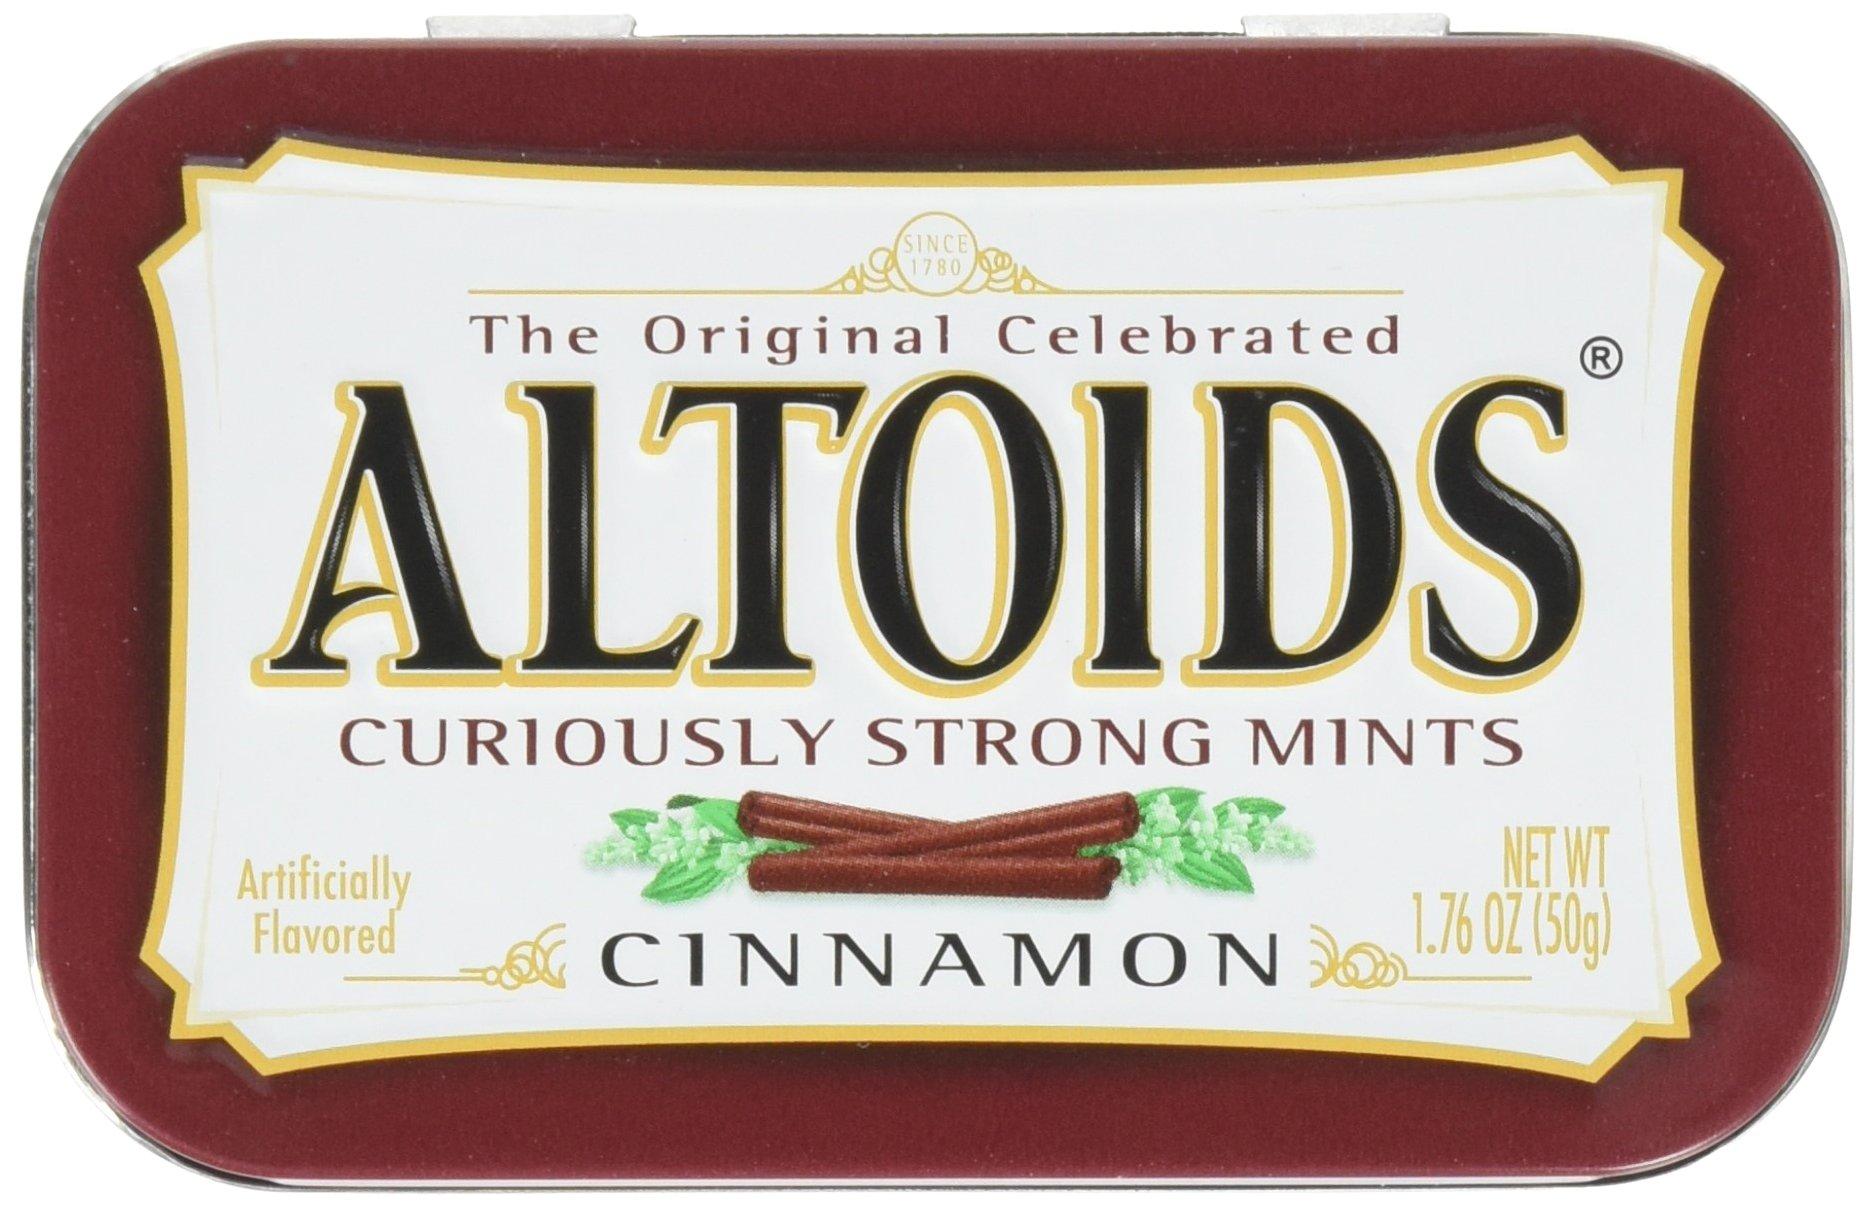 Altoids Curiously Strong Mints, Cinnamon, 1.76oz Per Tin, 6 Tin Pack